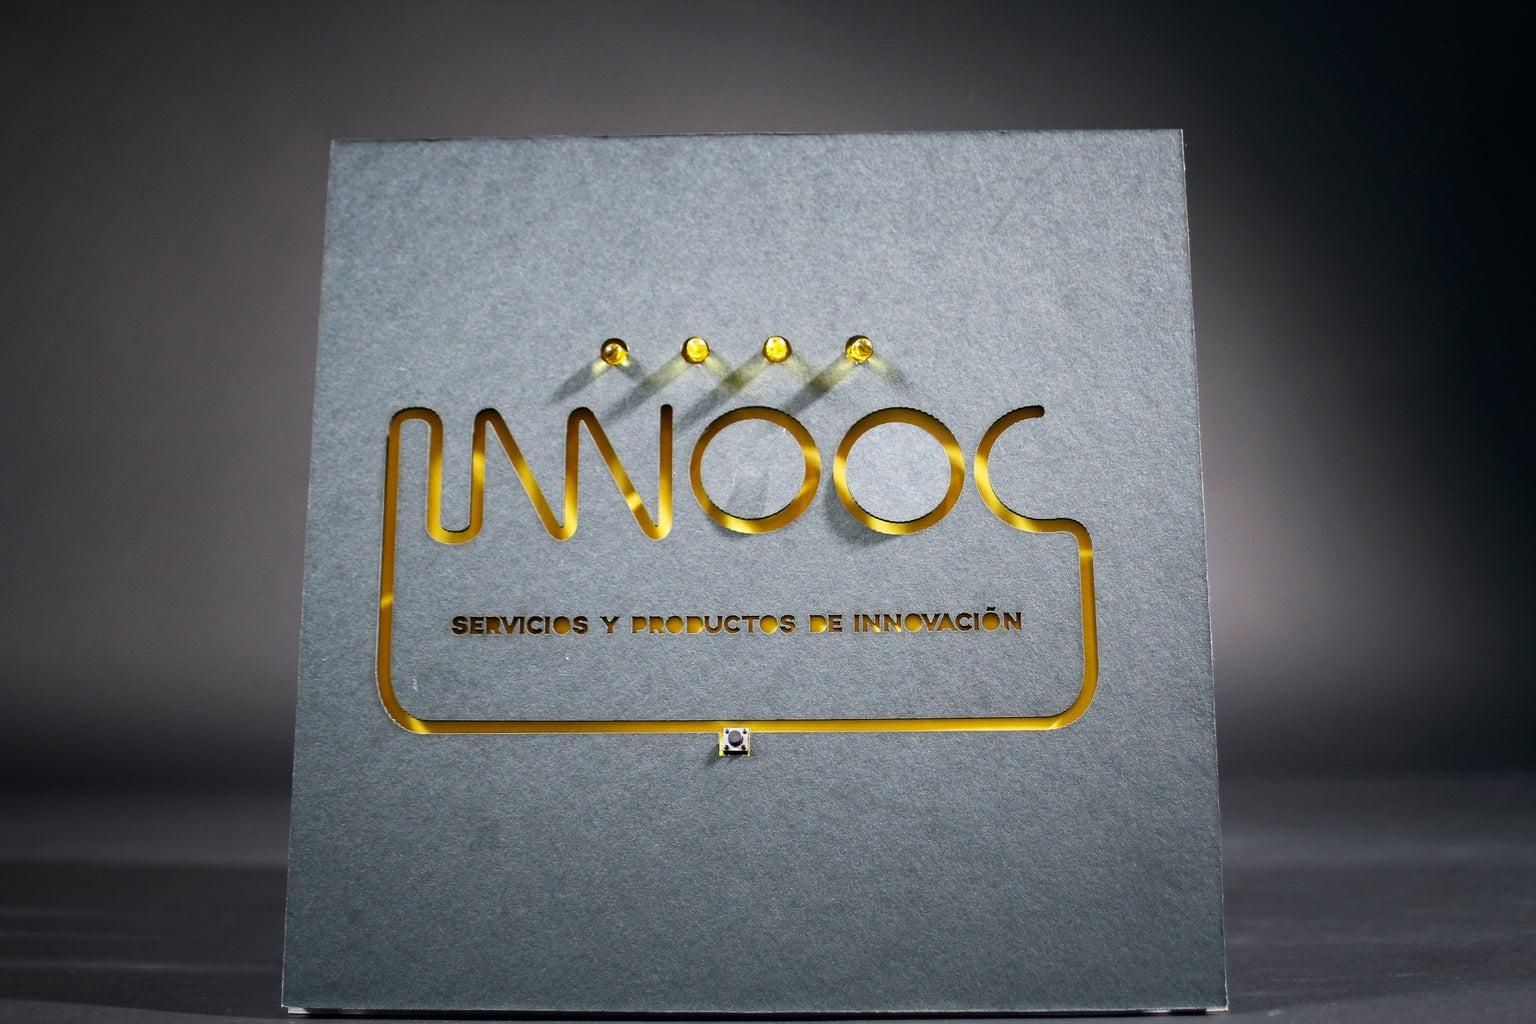 Innooc